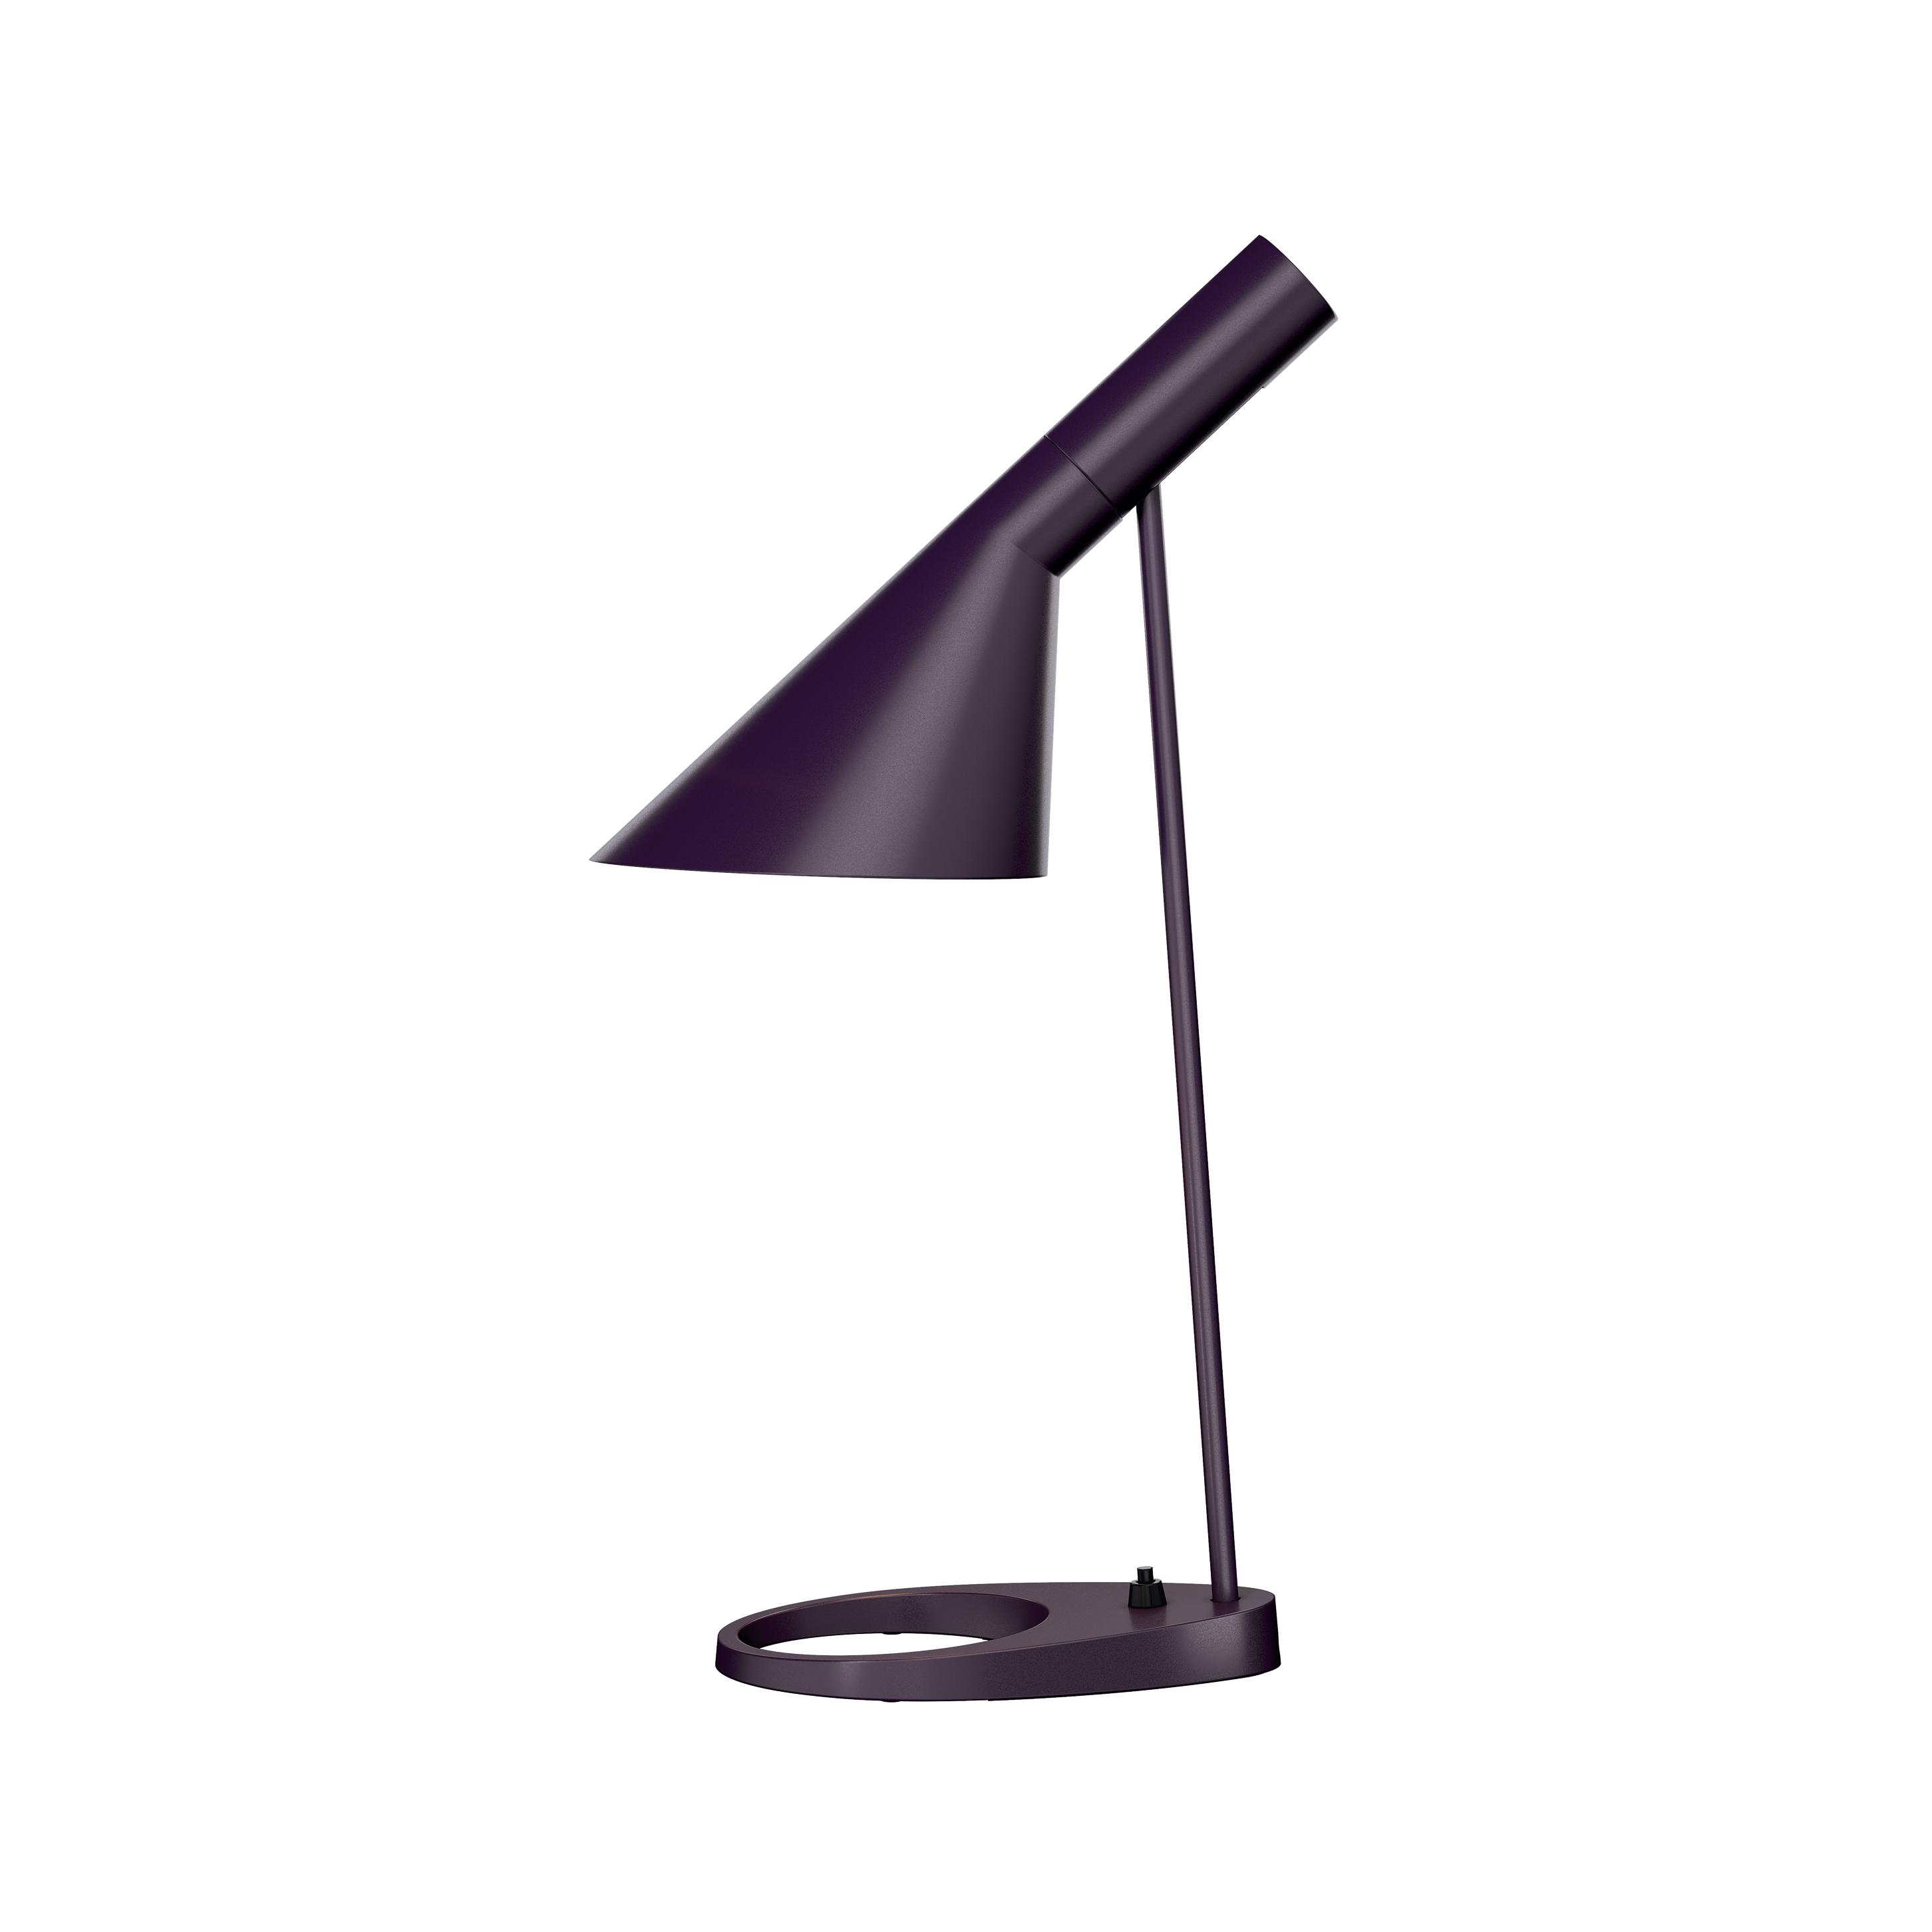 lampe poser aj violet l21 5cm h56cm louis poulsen. Black Bedroom Furniture Sets. Home Design Ideas